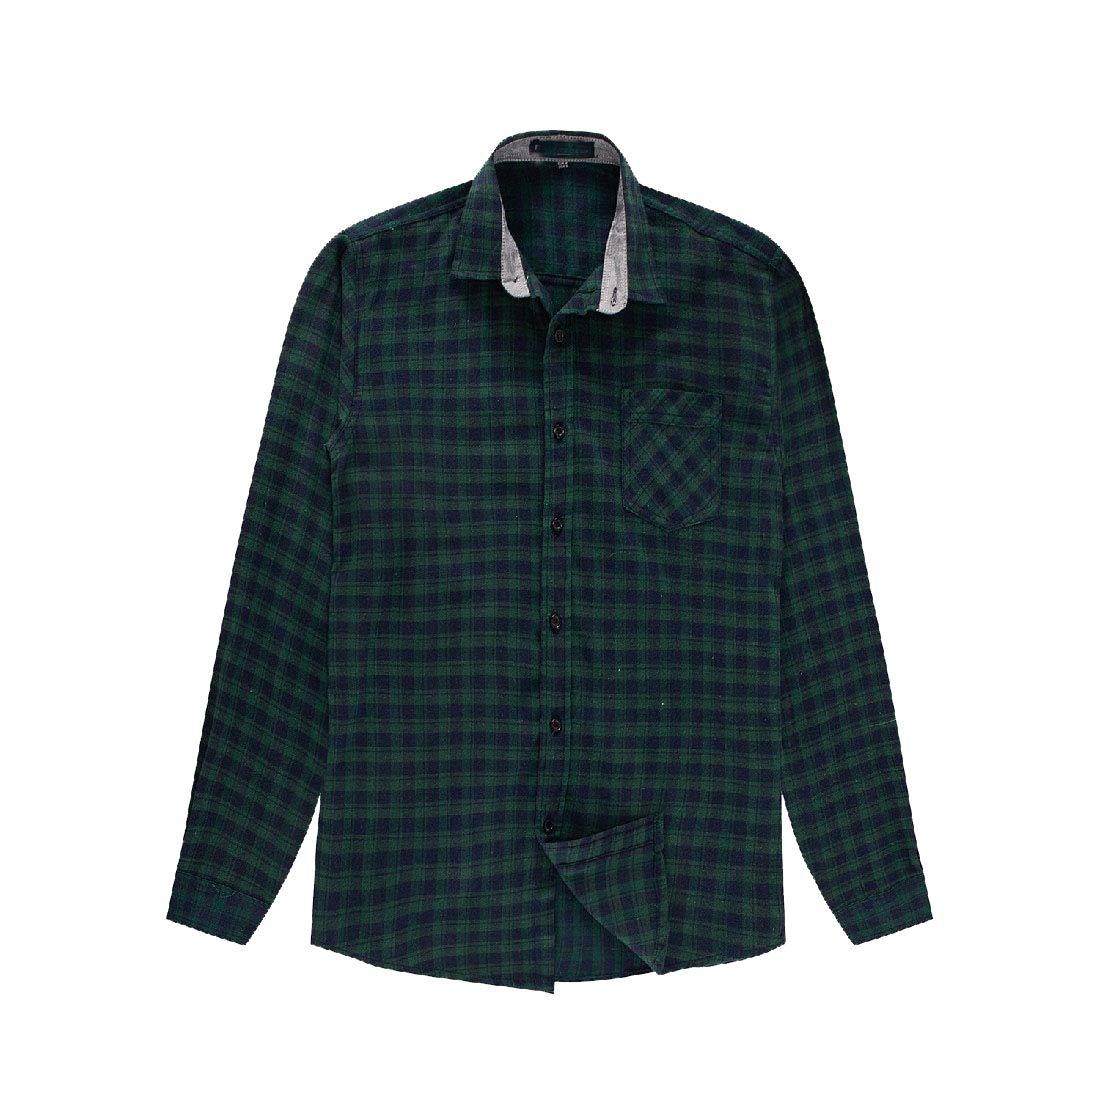 YUNY Mens Button Down Plaid Oversized Long Sleeve Cotton T-Shirts Shirts AS2 XL